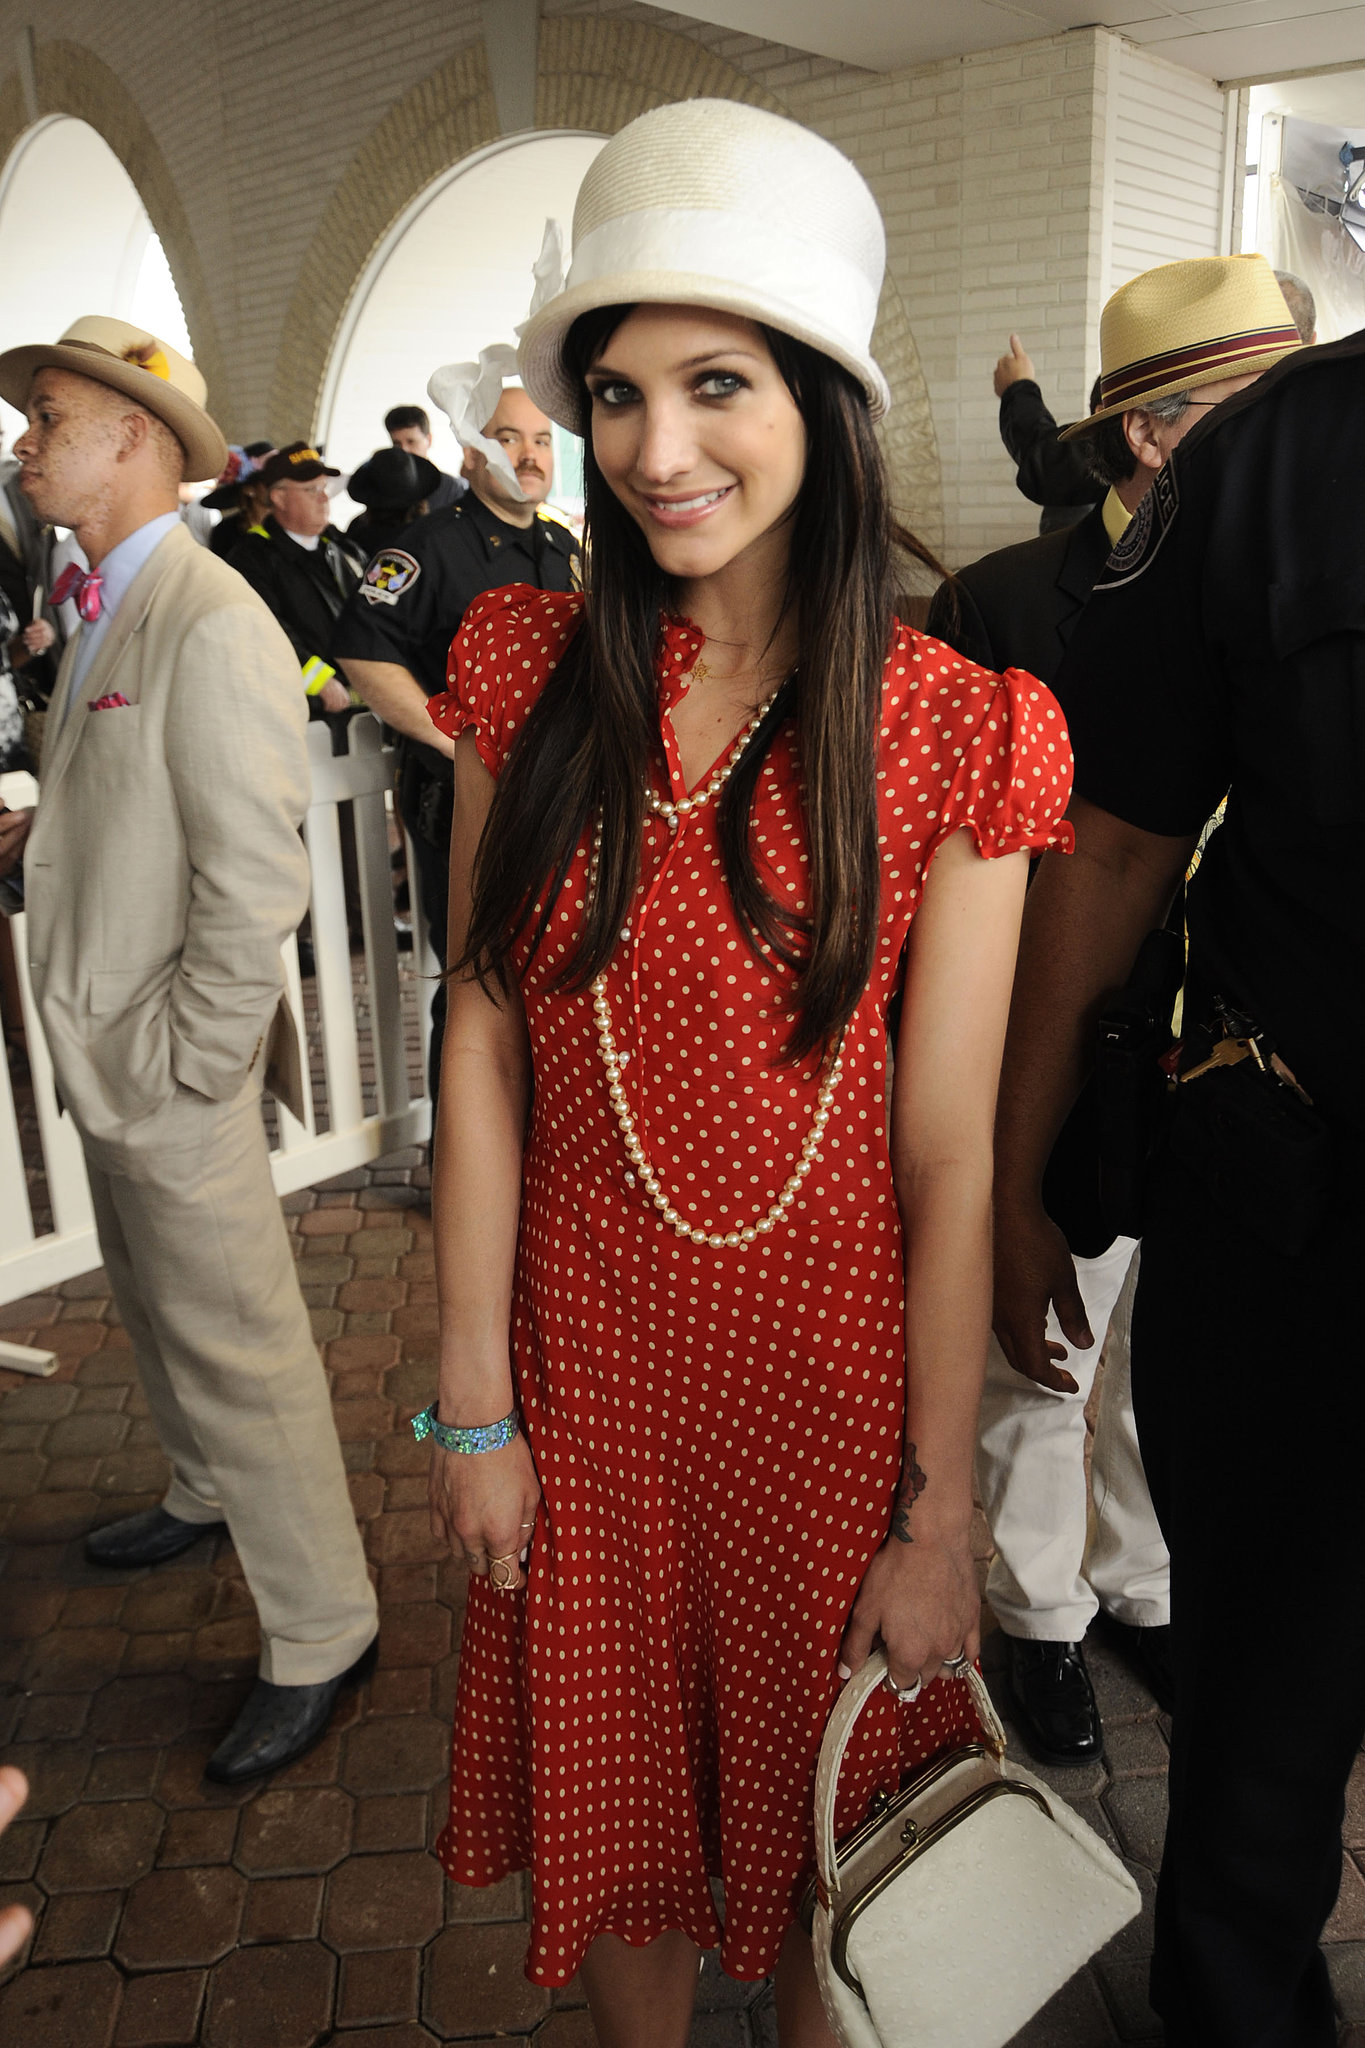 Ashlee Simpson posed in polka dots in 2010.